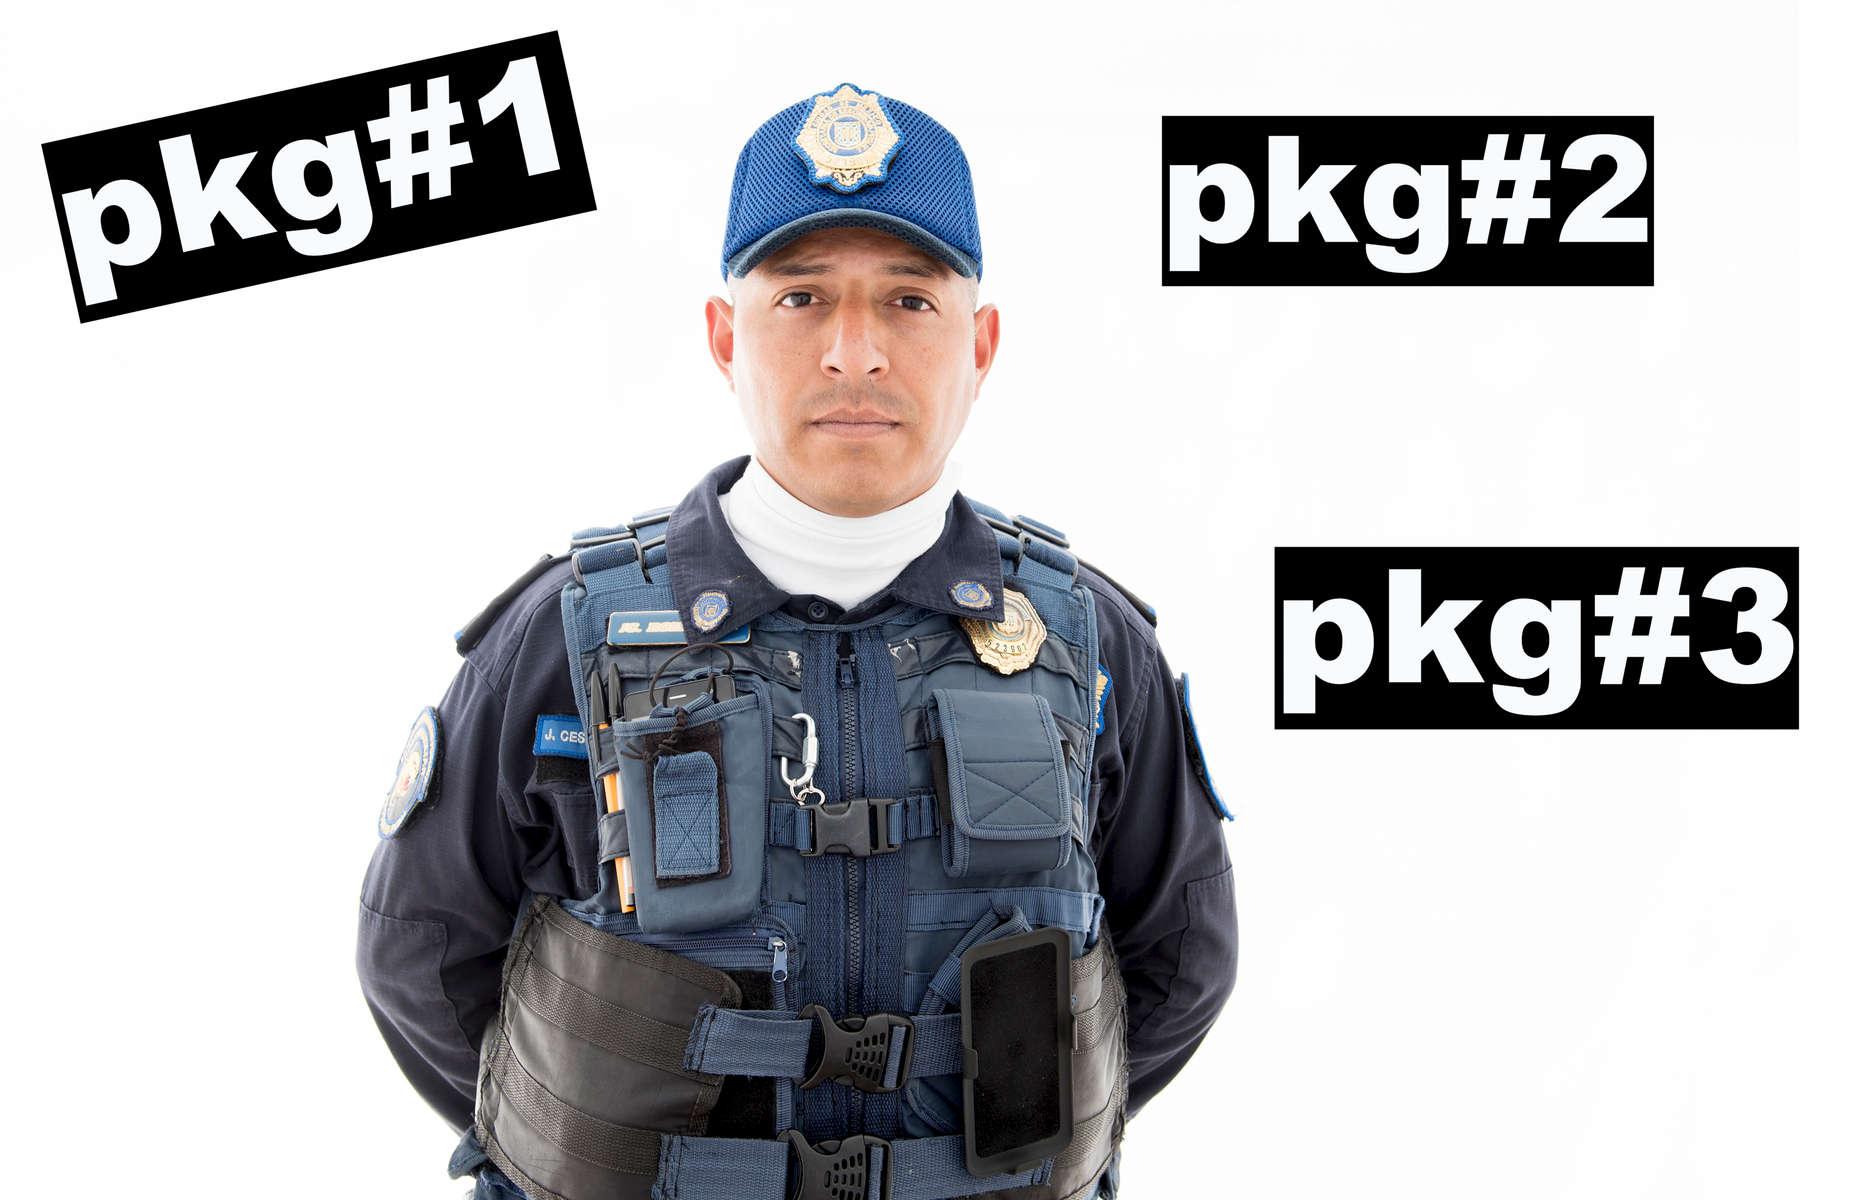 PoliceHDSHTlores